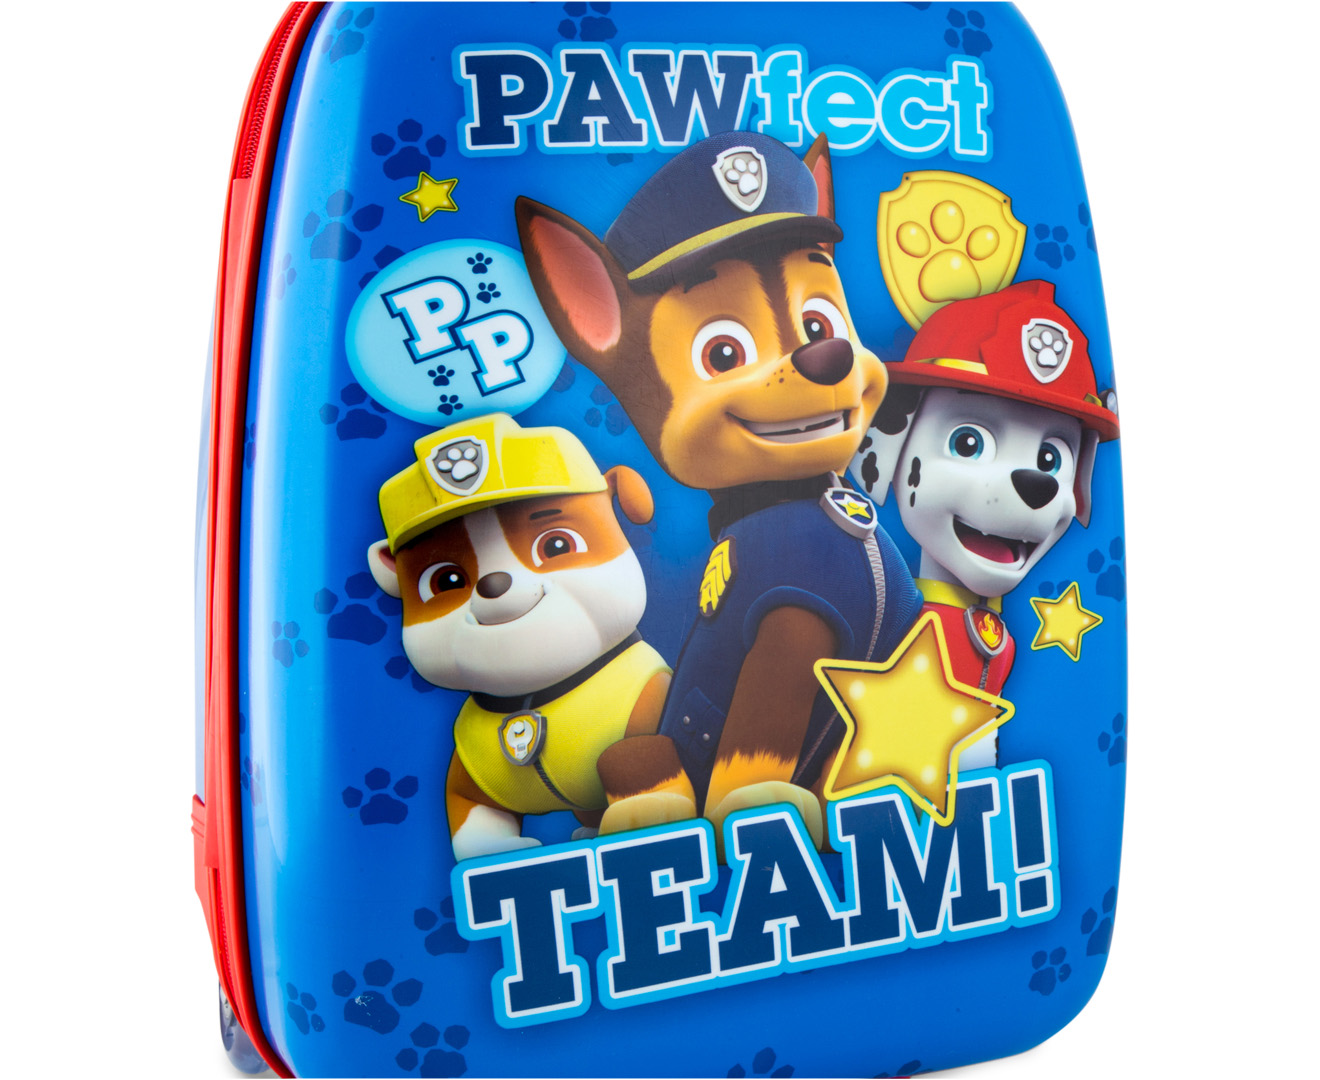 ddf114a311a8 Paw Patrol Kids  47x30cm Hardshell Suitcase - Blue